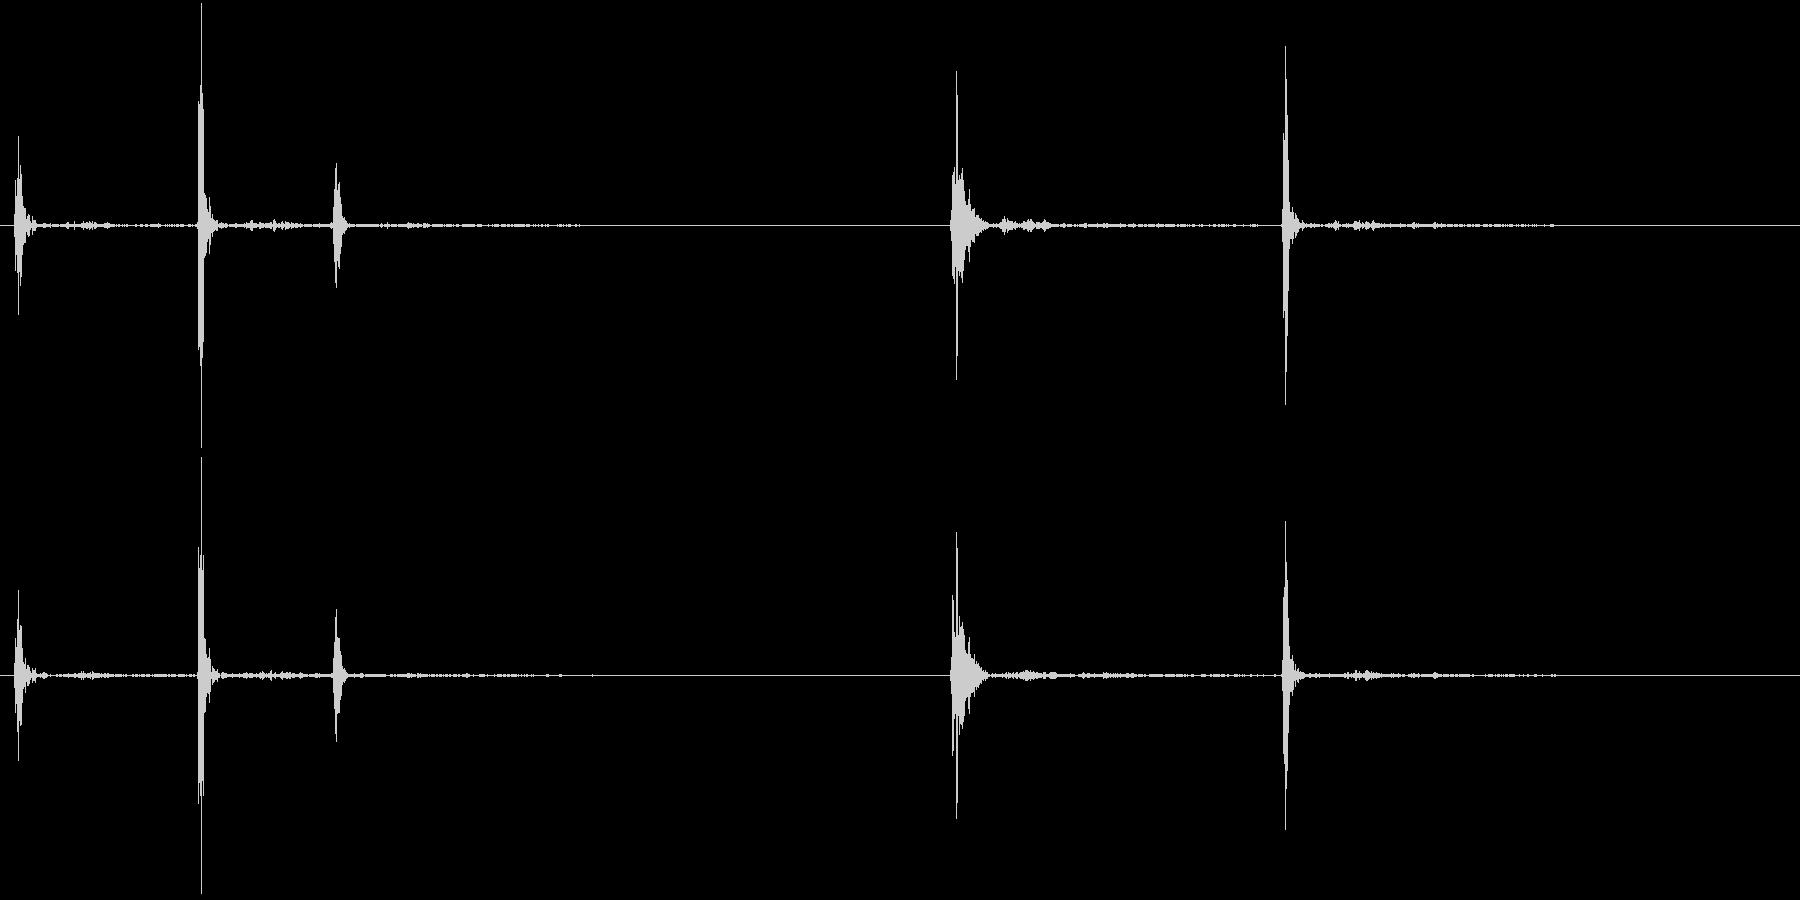 Anime 指の関節を鳴らす音 3の未再生の波形